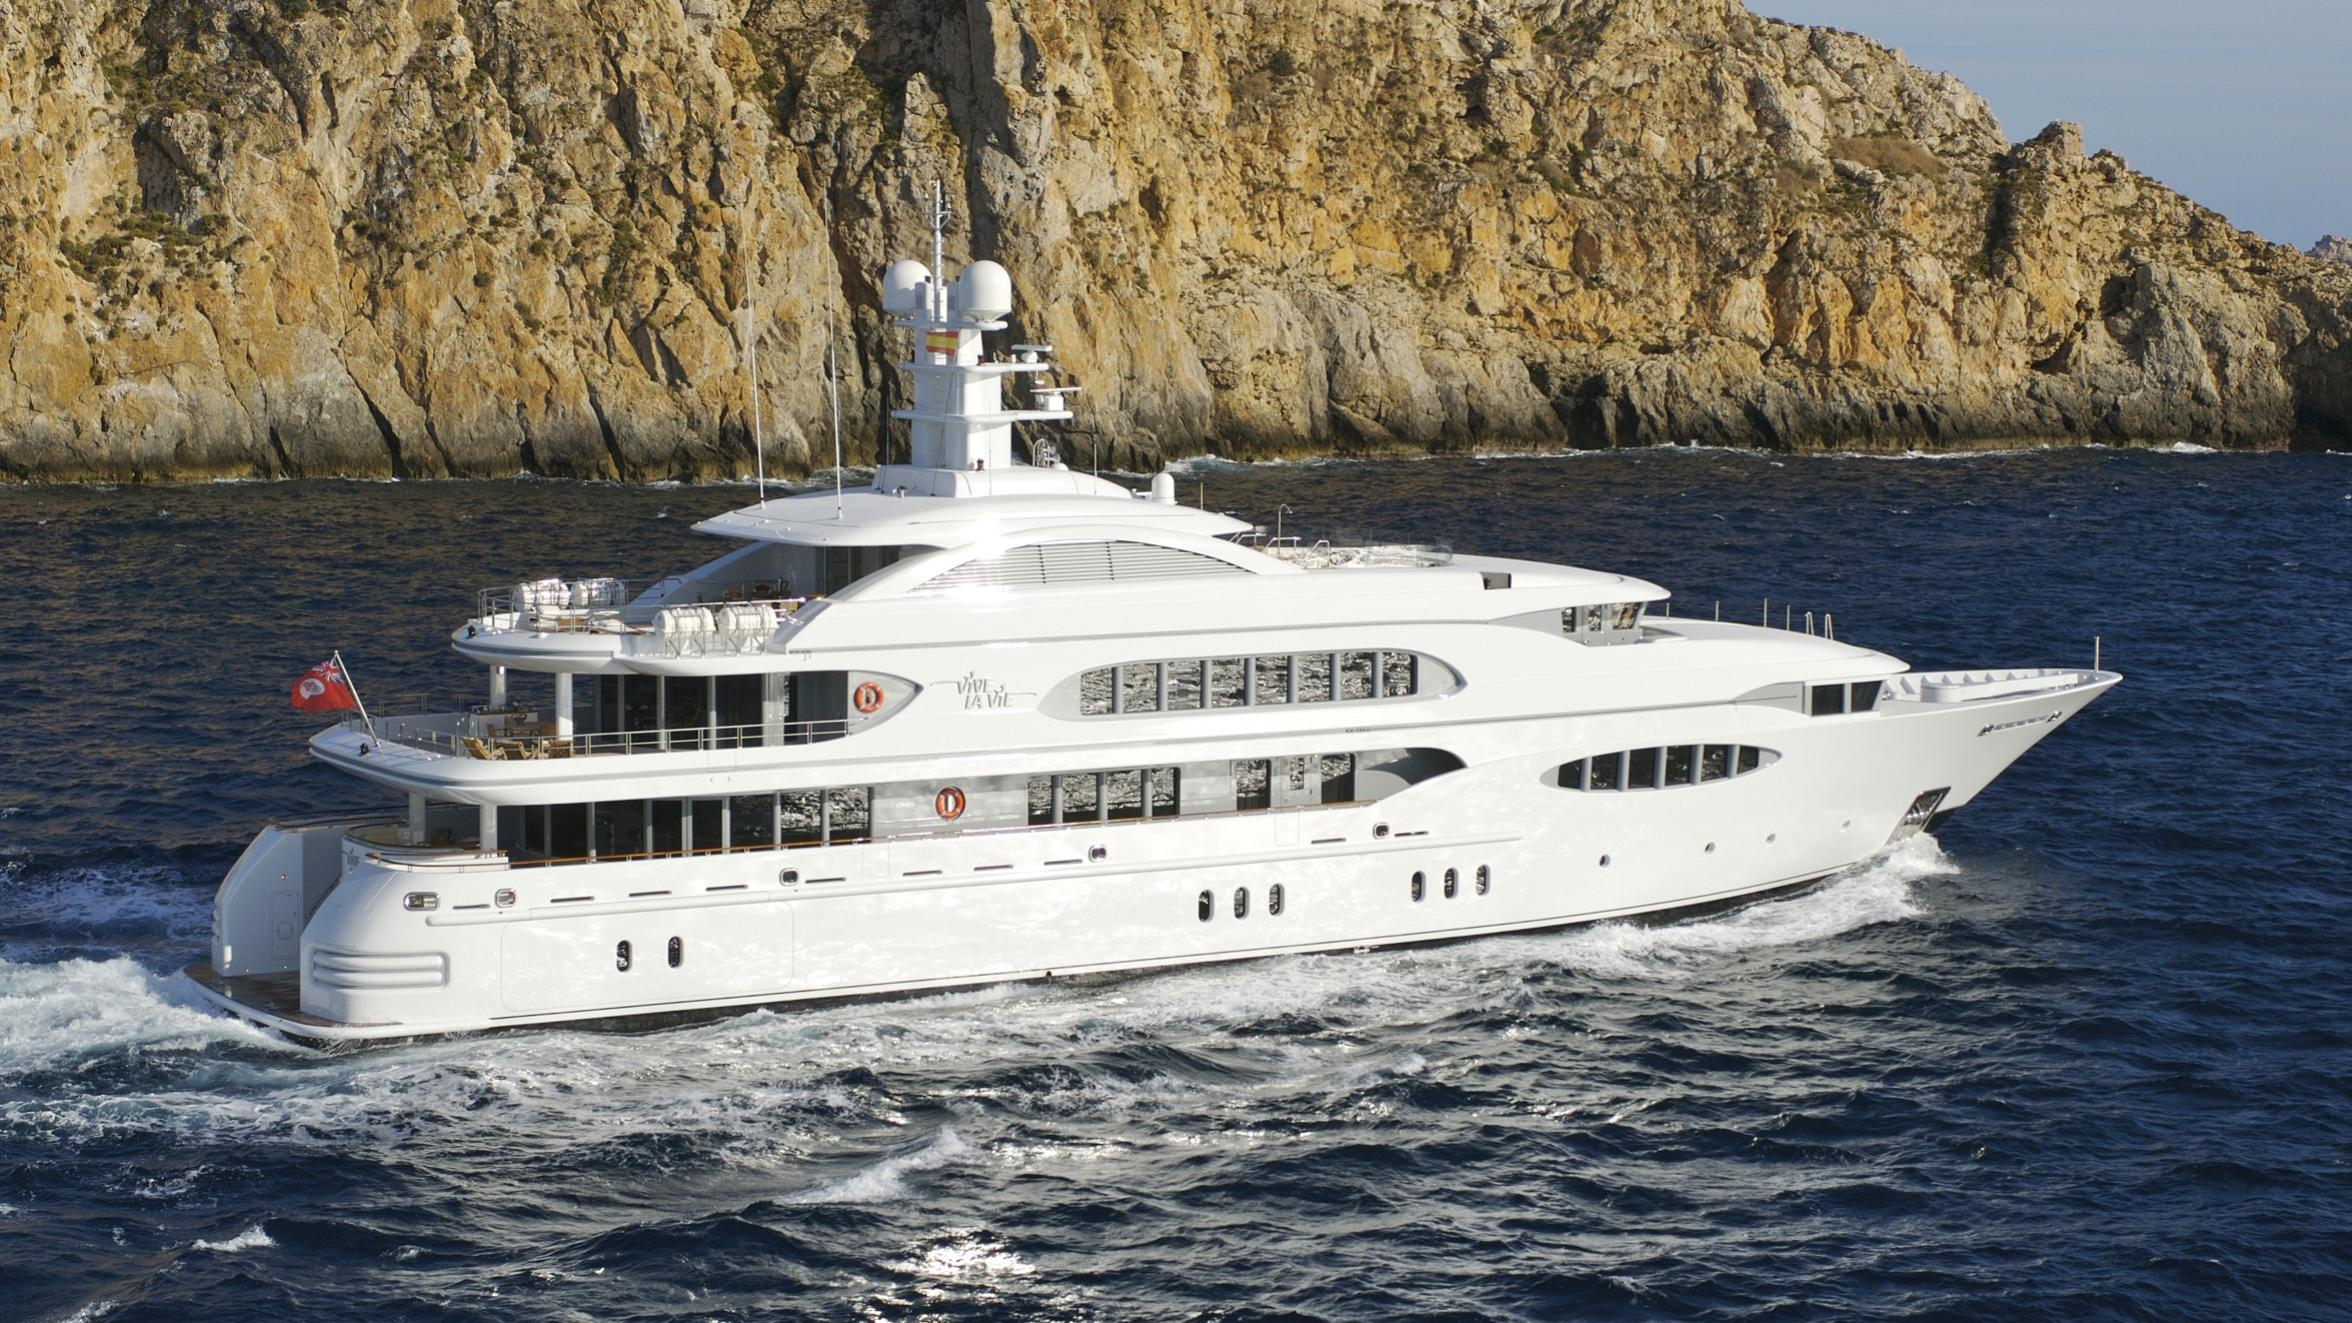 Vive la Vie yacht running